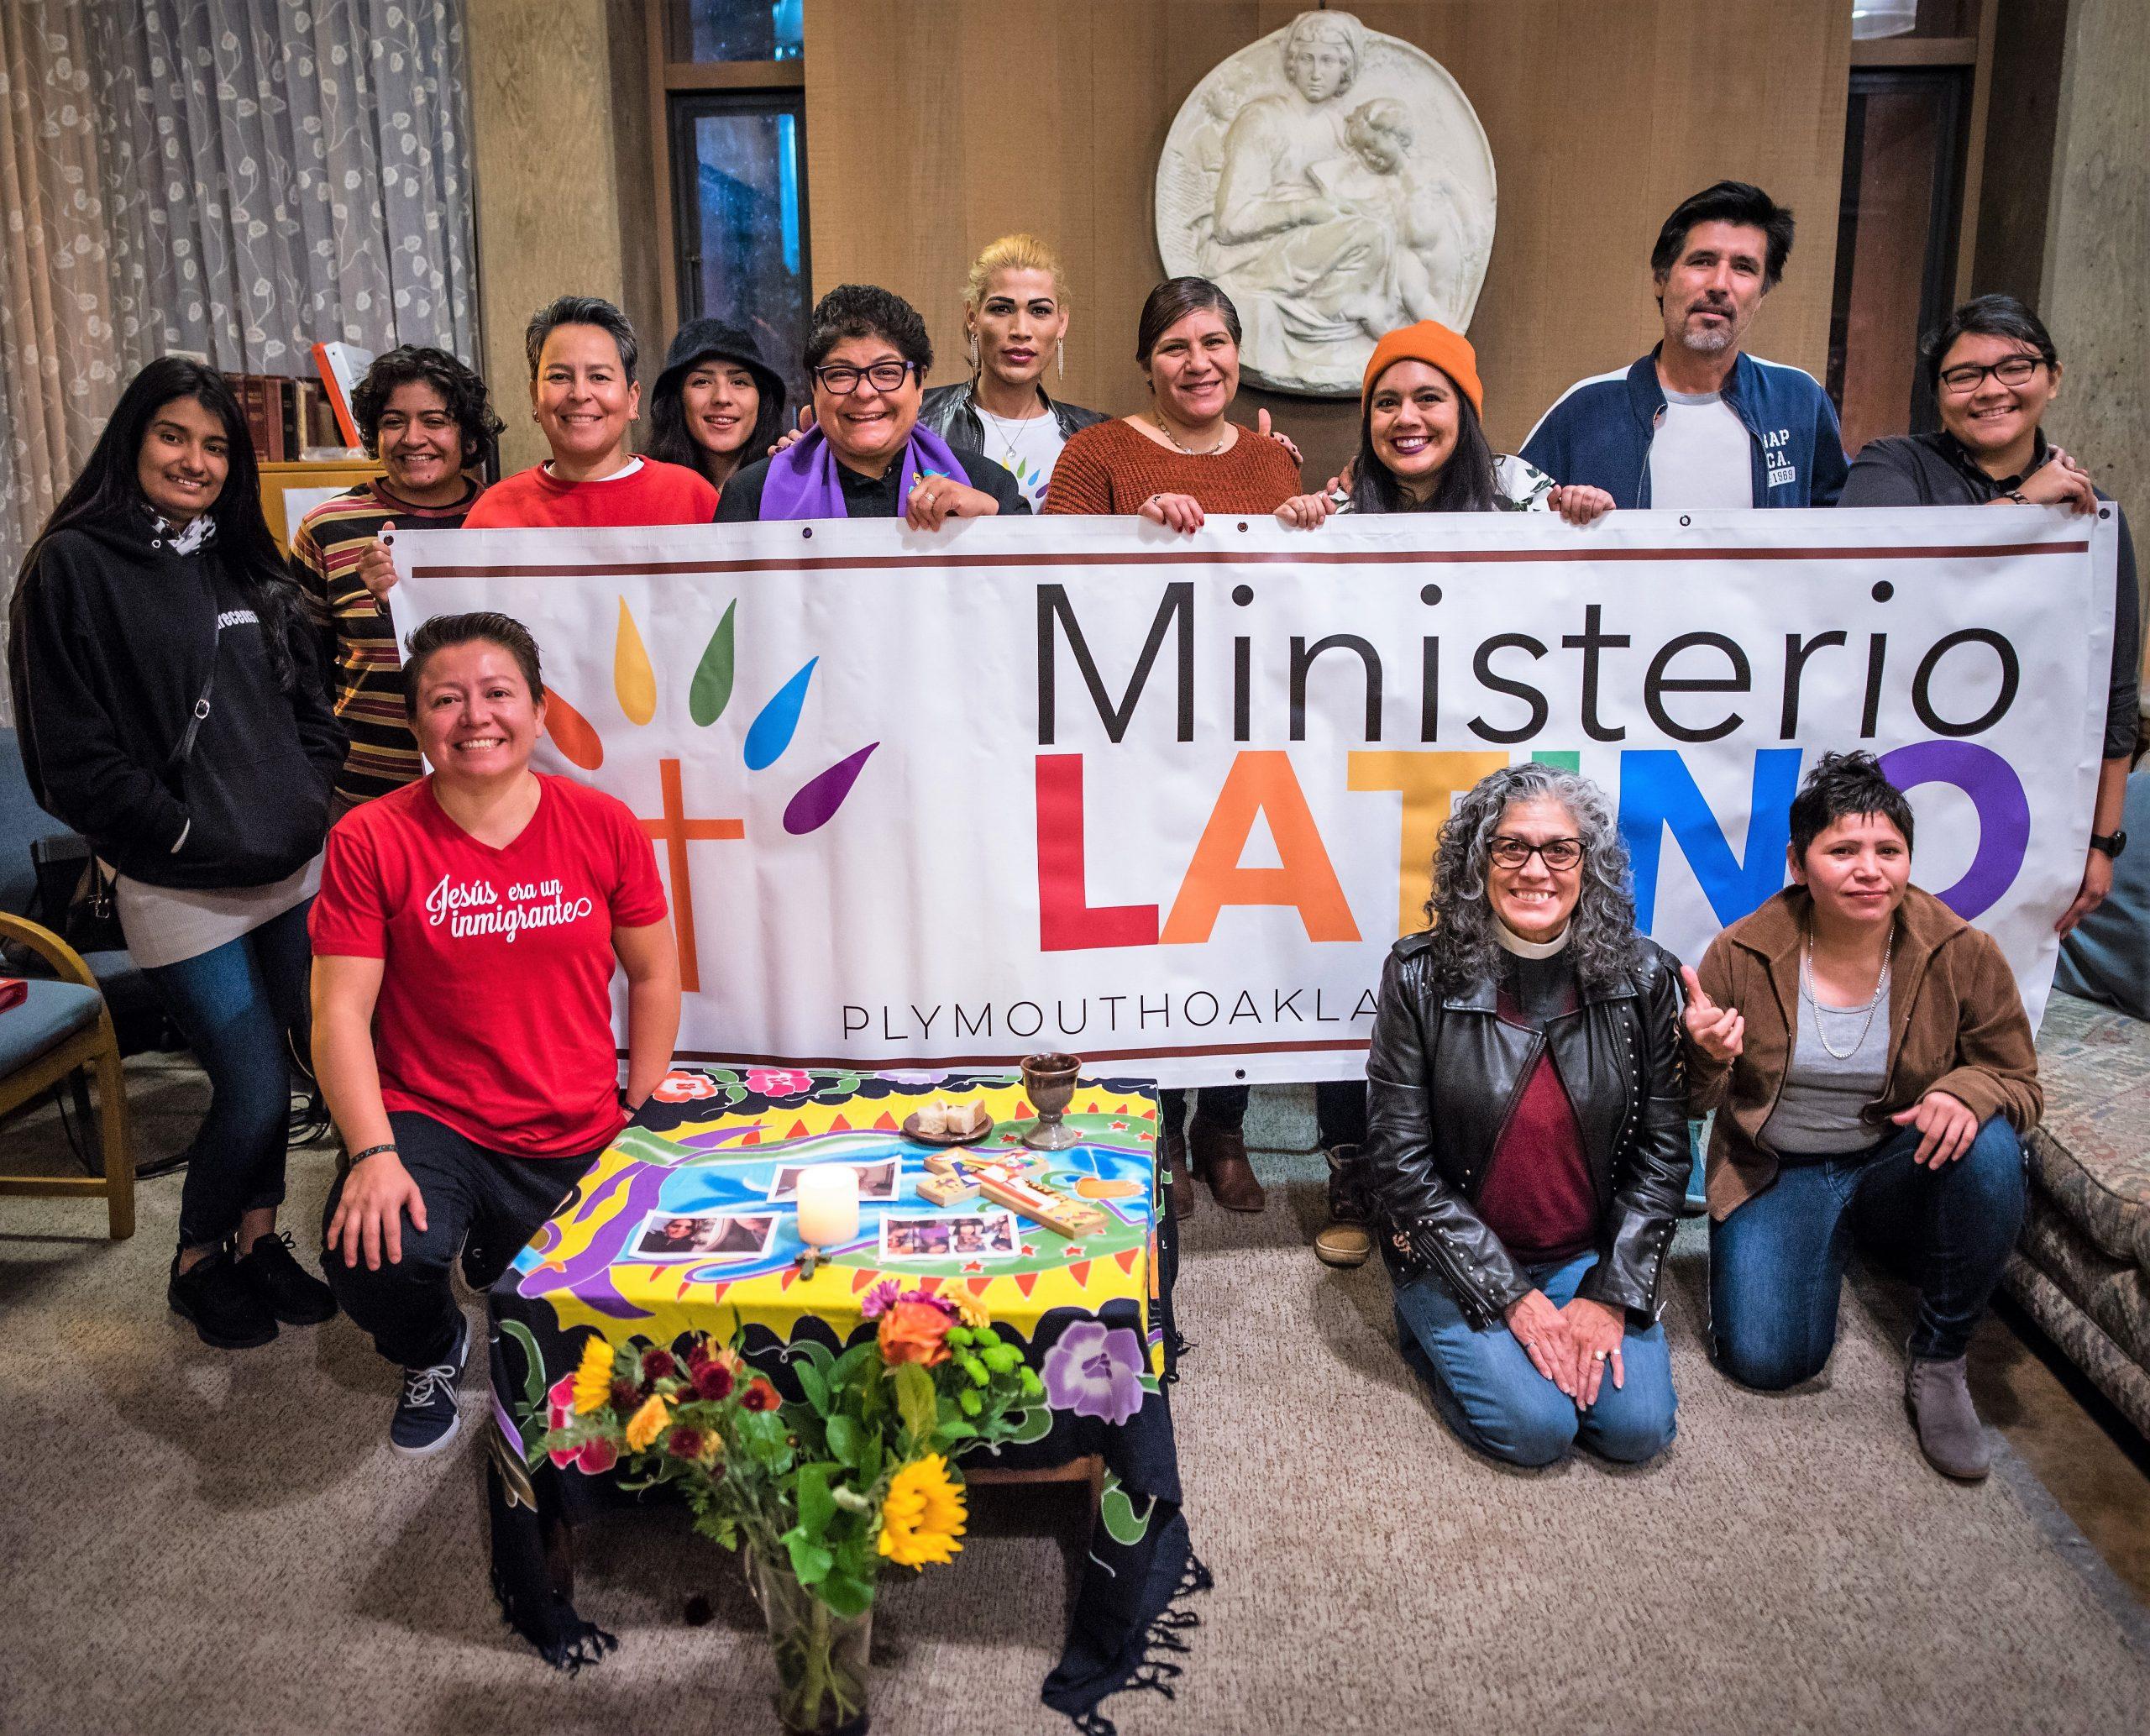 Ministerio Latino banner December 2019